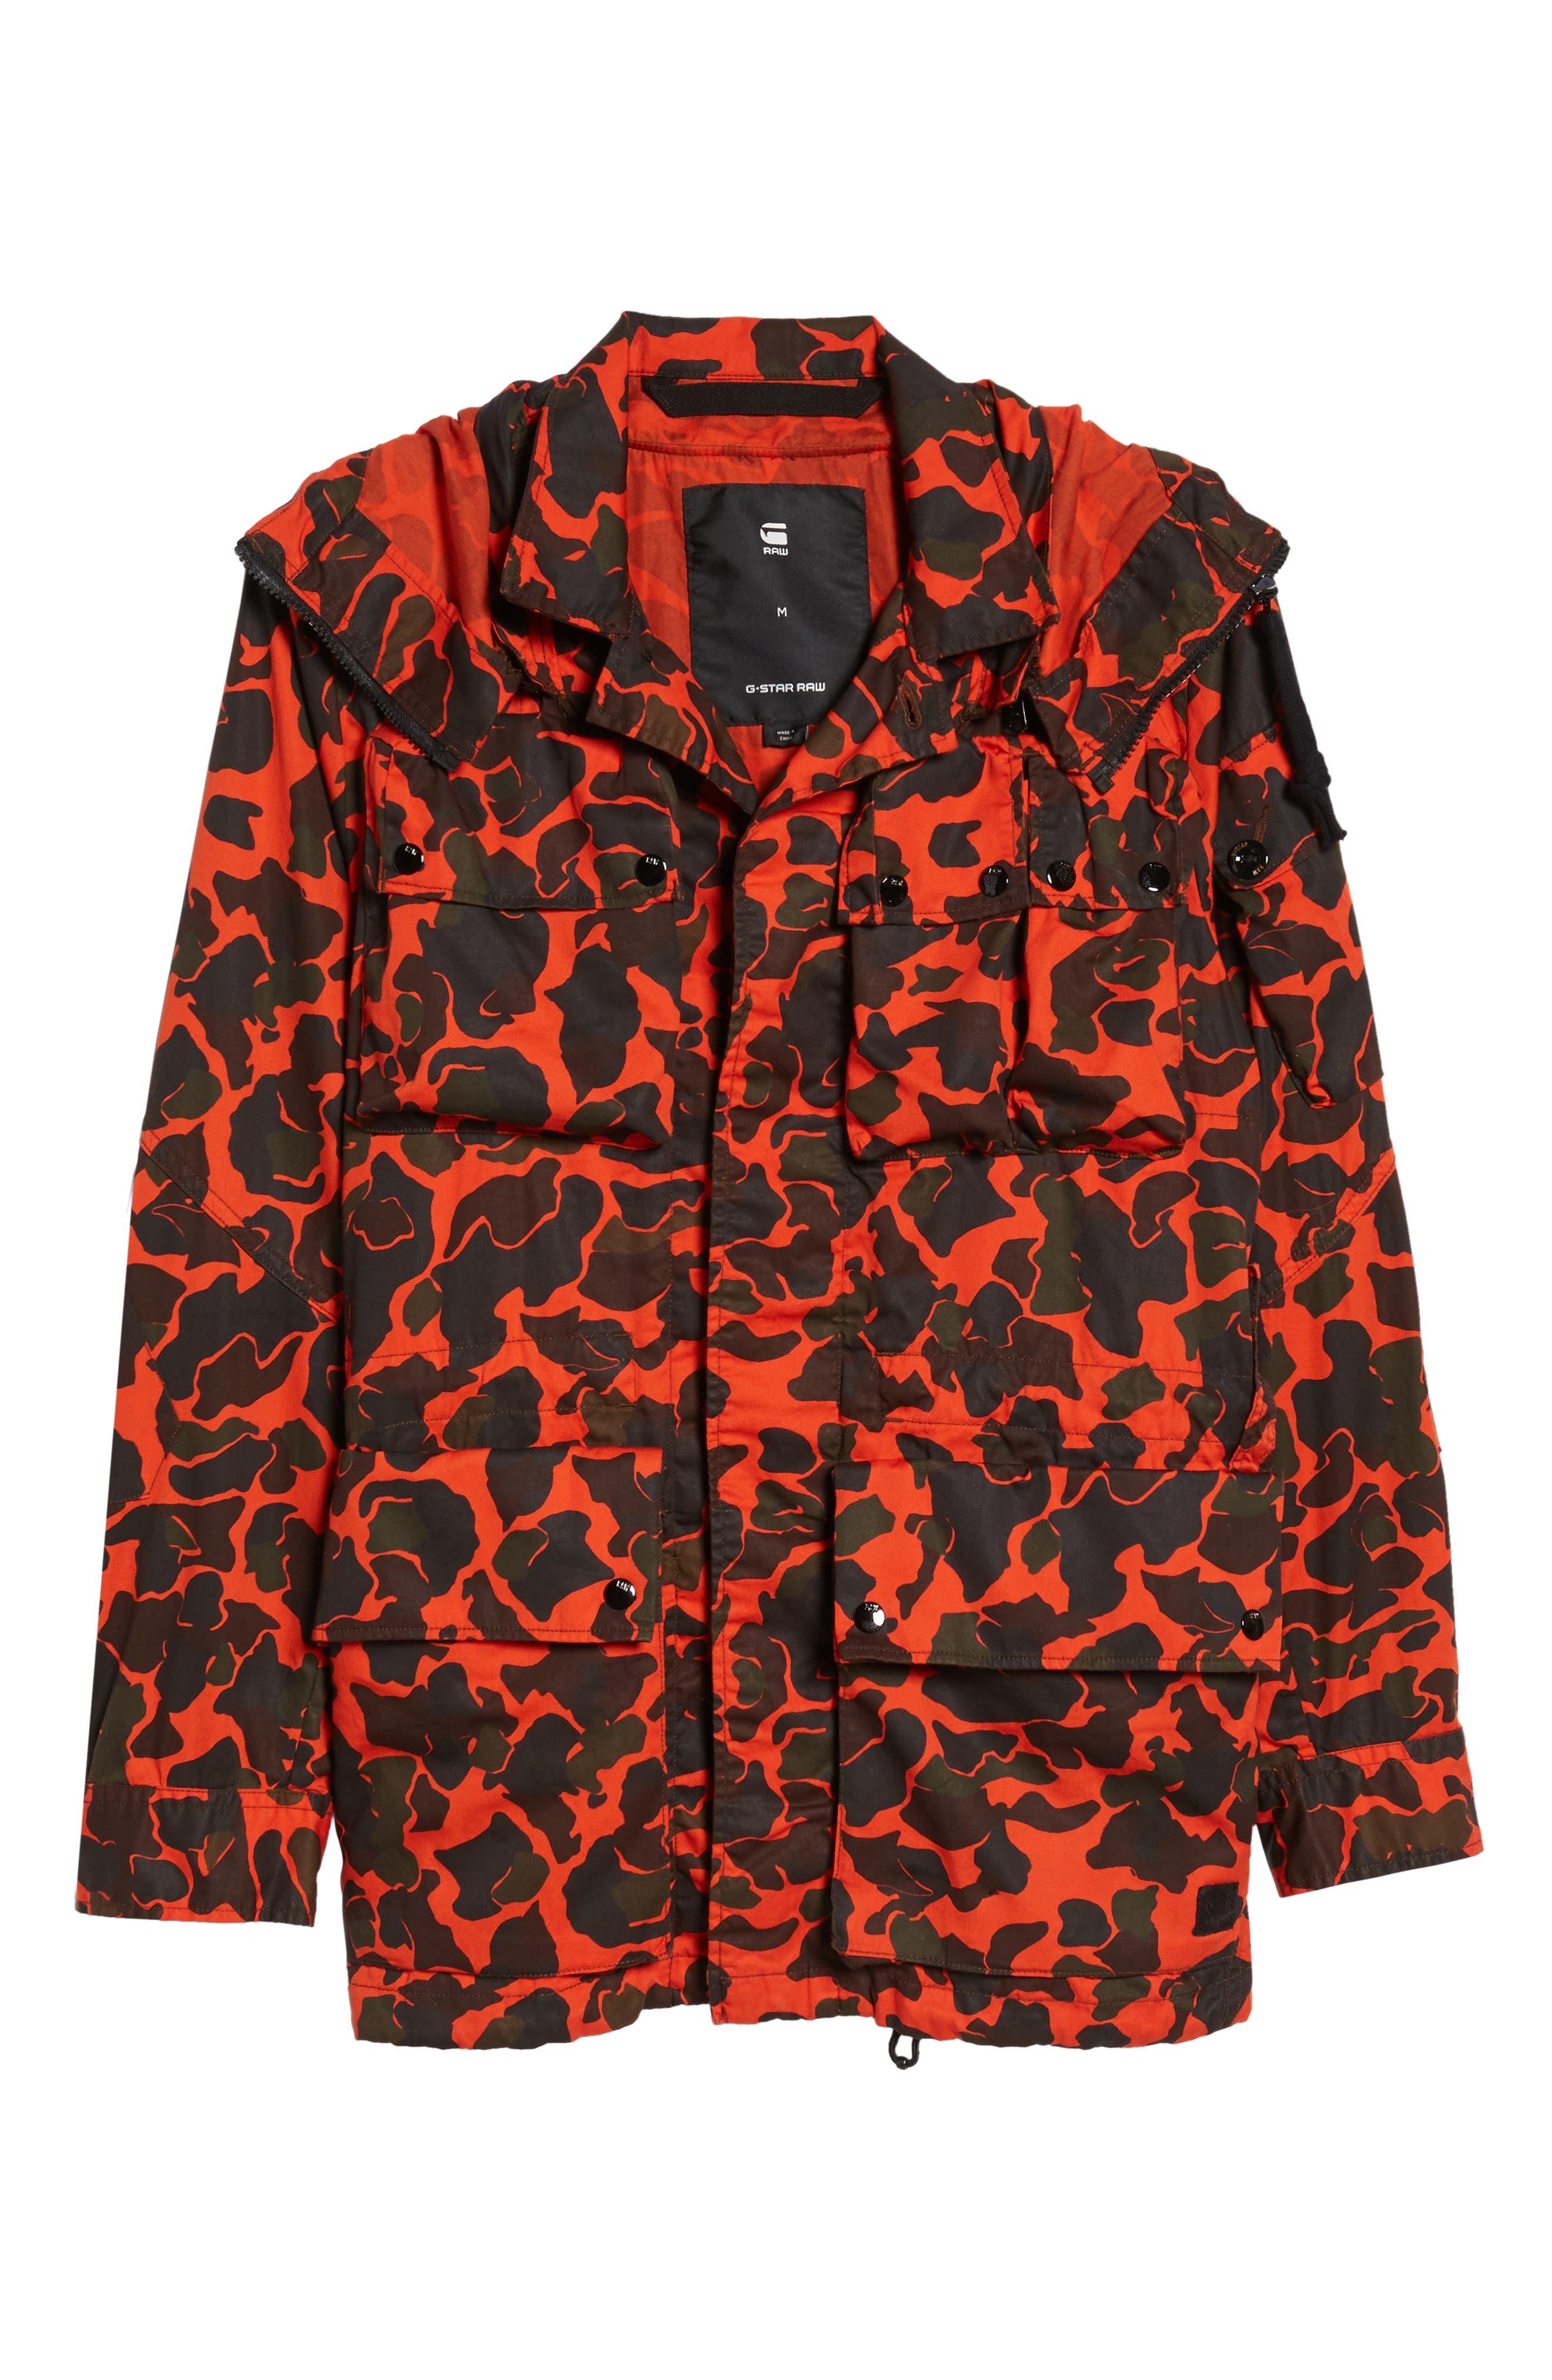 Ospak Submarine Hooded Jacket,                             Alternate thumbnail 5, color,                             800